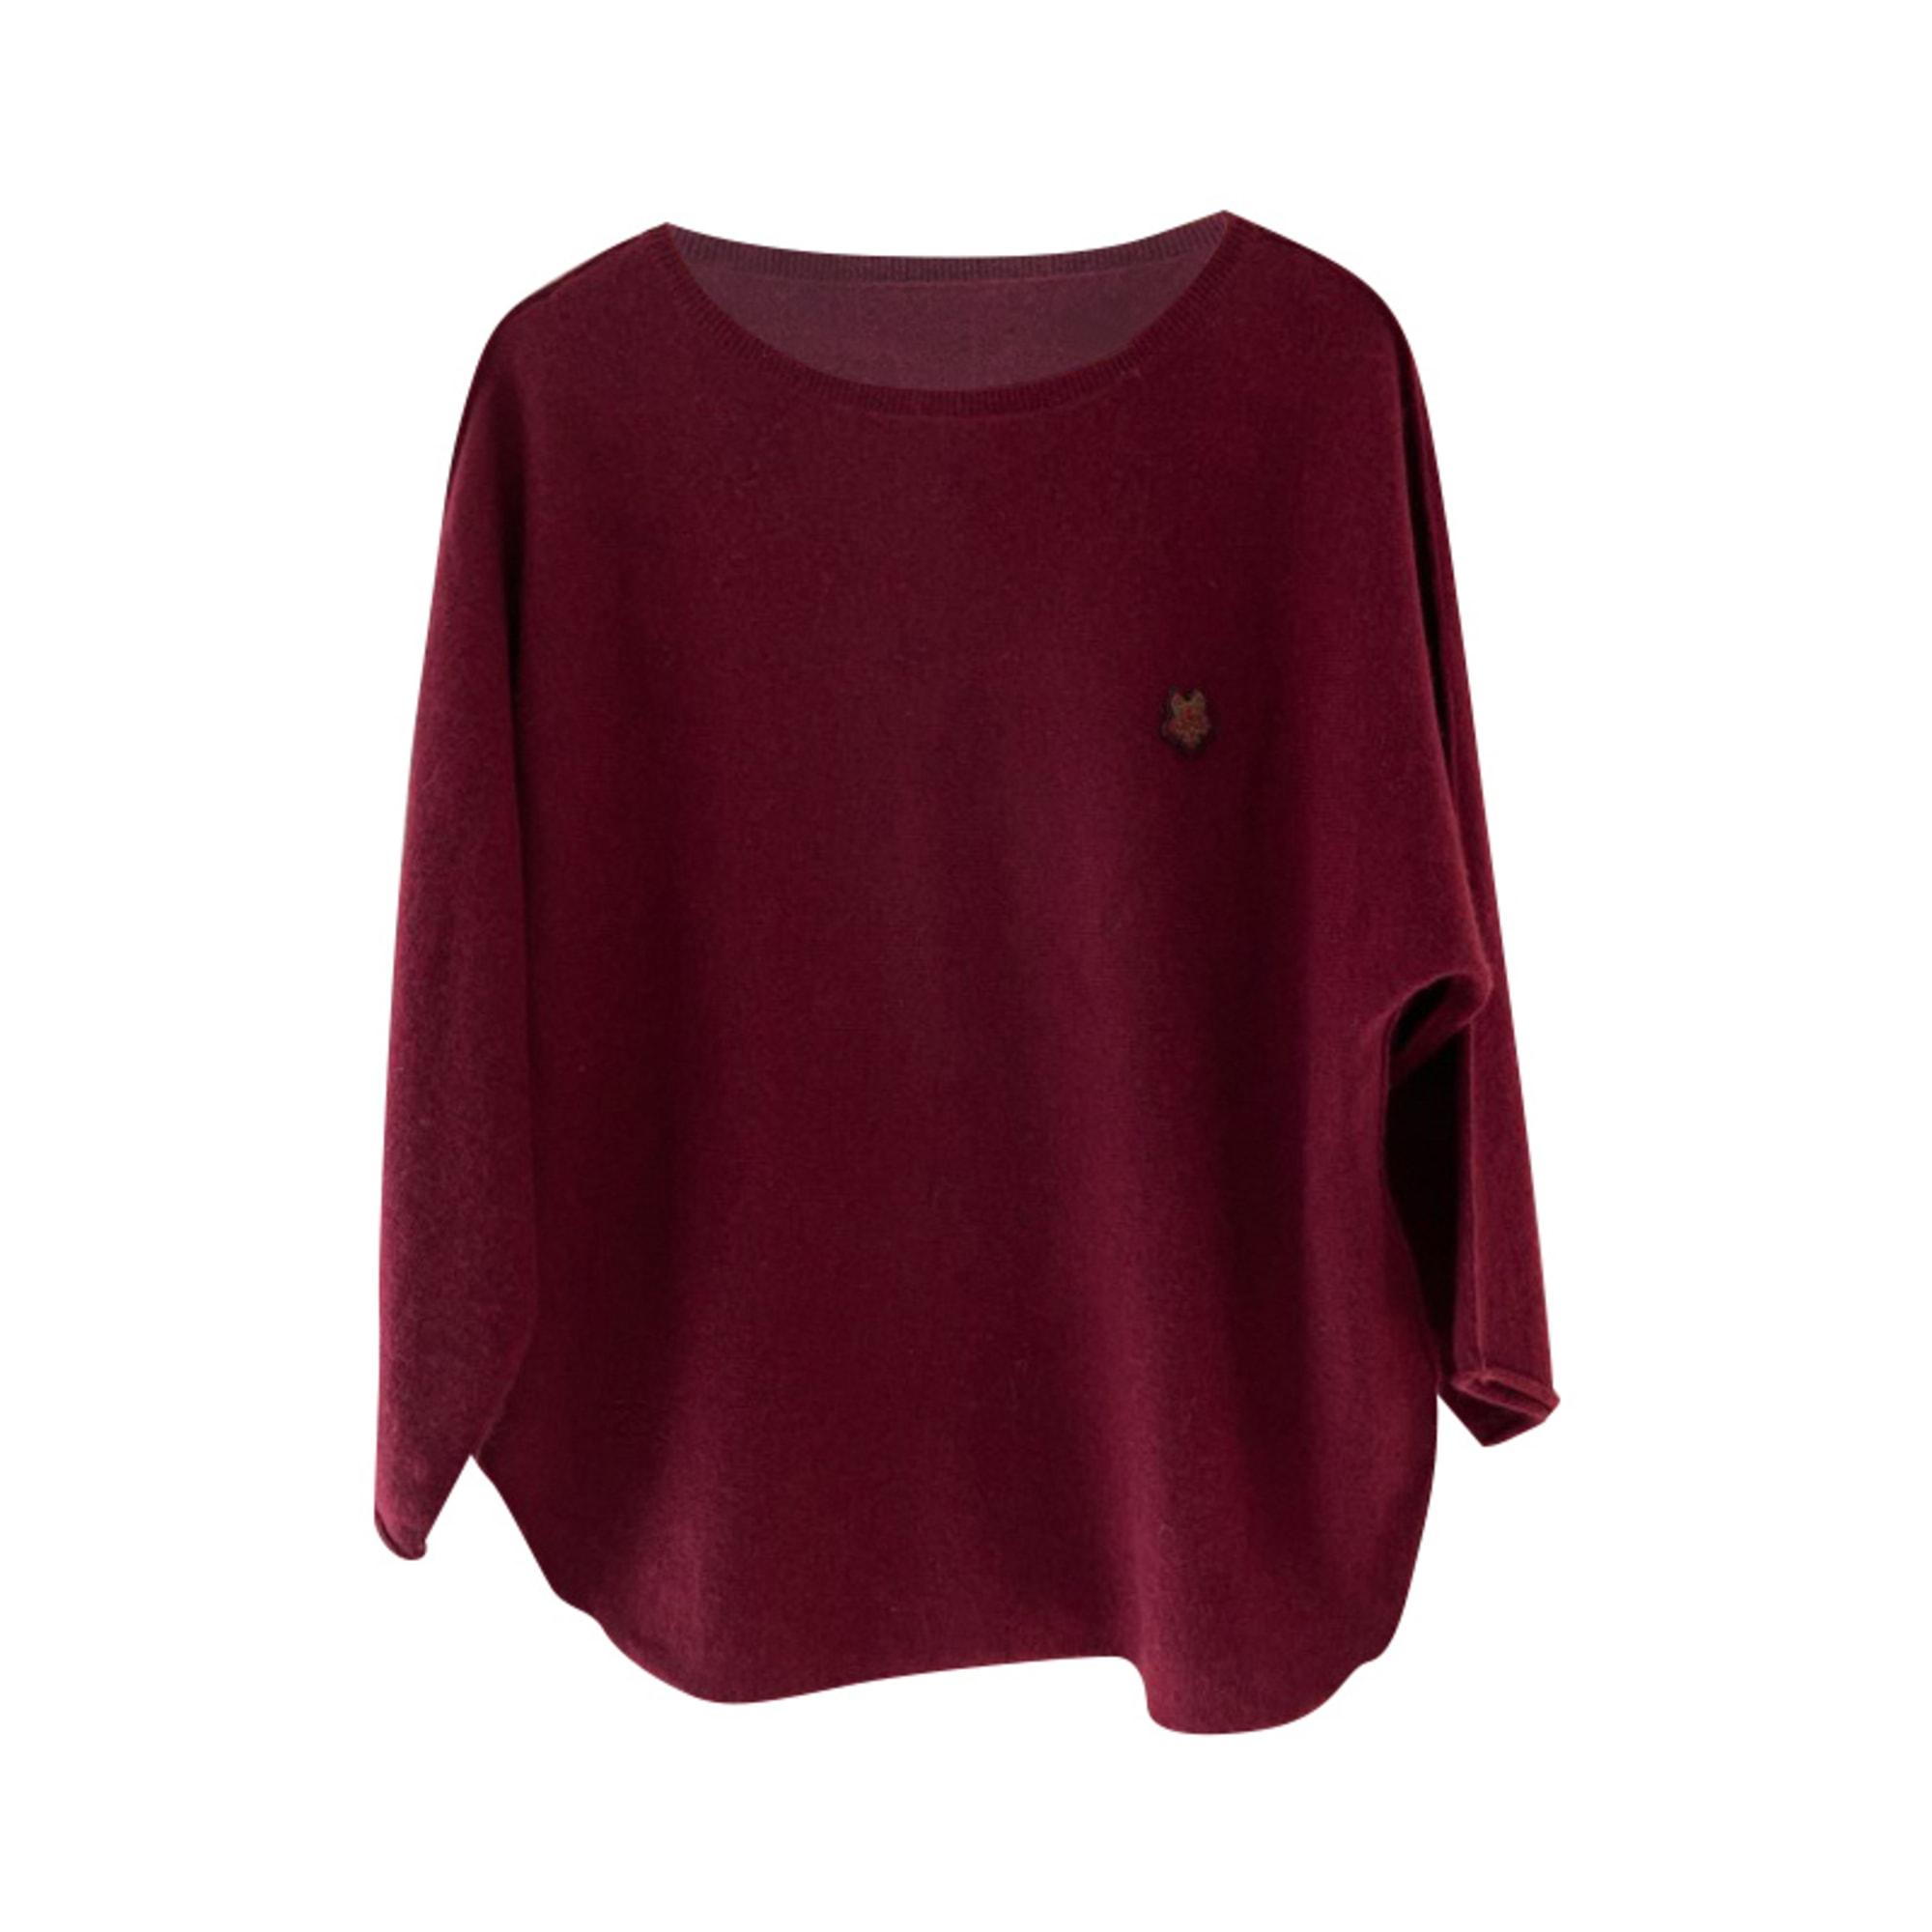 Sweater ZADIG & VOLTAIRE Red, burgundy